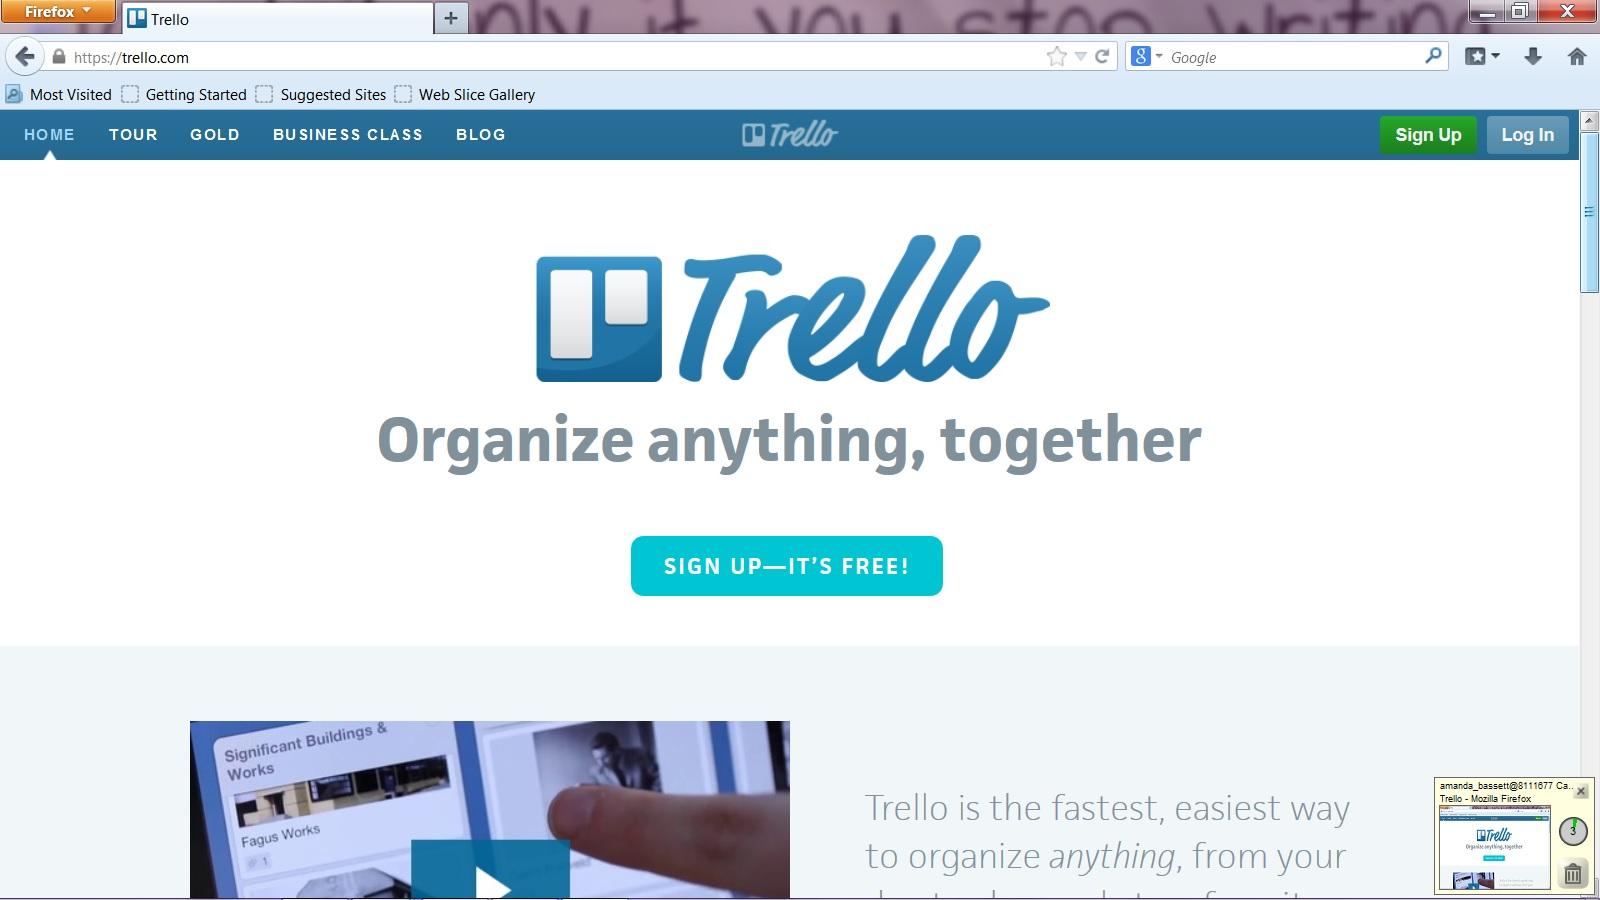 Trello - Sign up, it's free.jpg